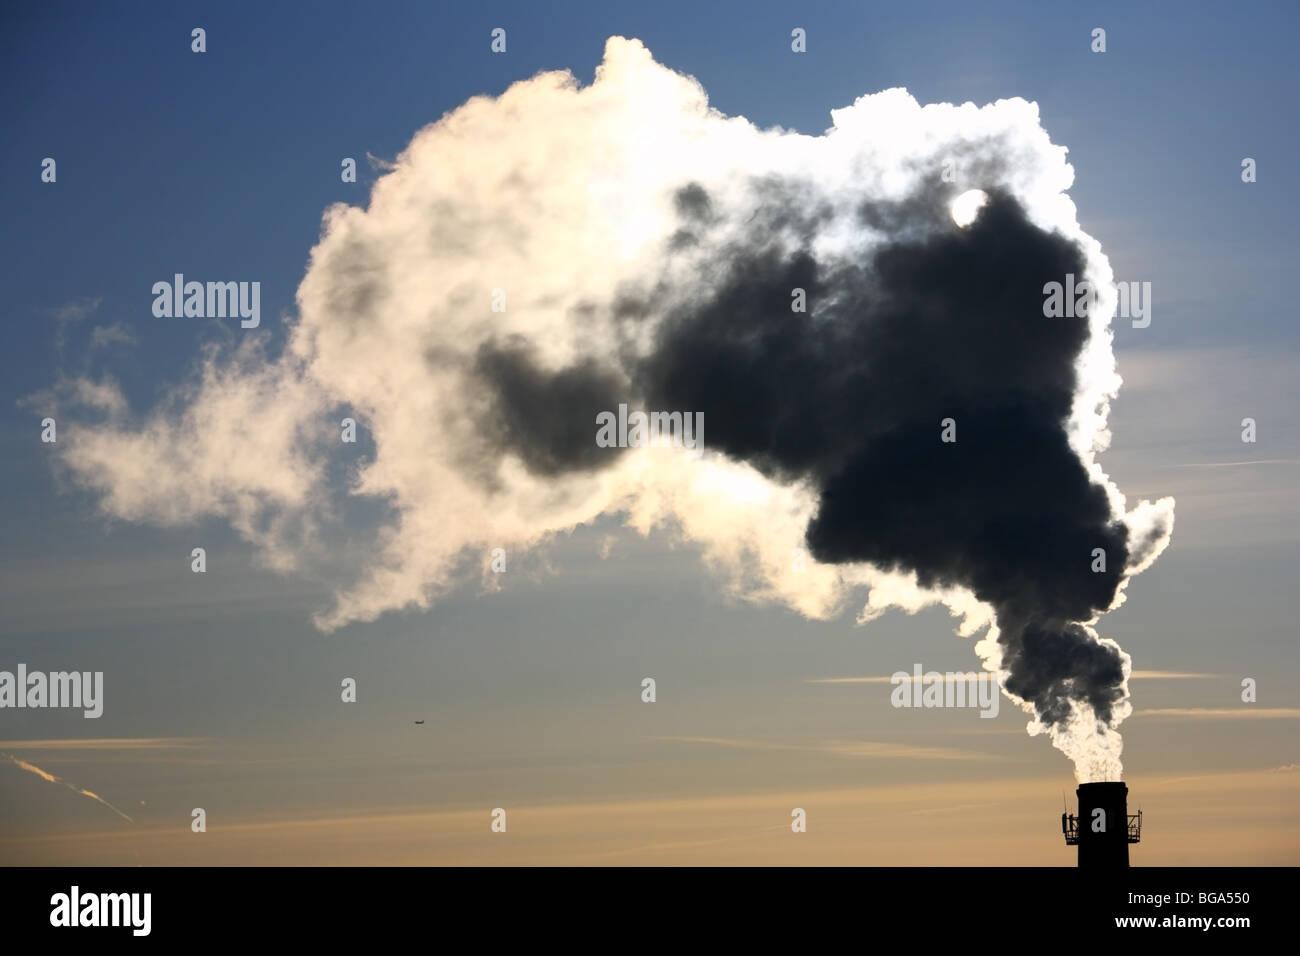 Smoke Pipe Nobody Stock Photos & Smoke Pipe Nobody Stock Images - Alamy